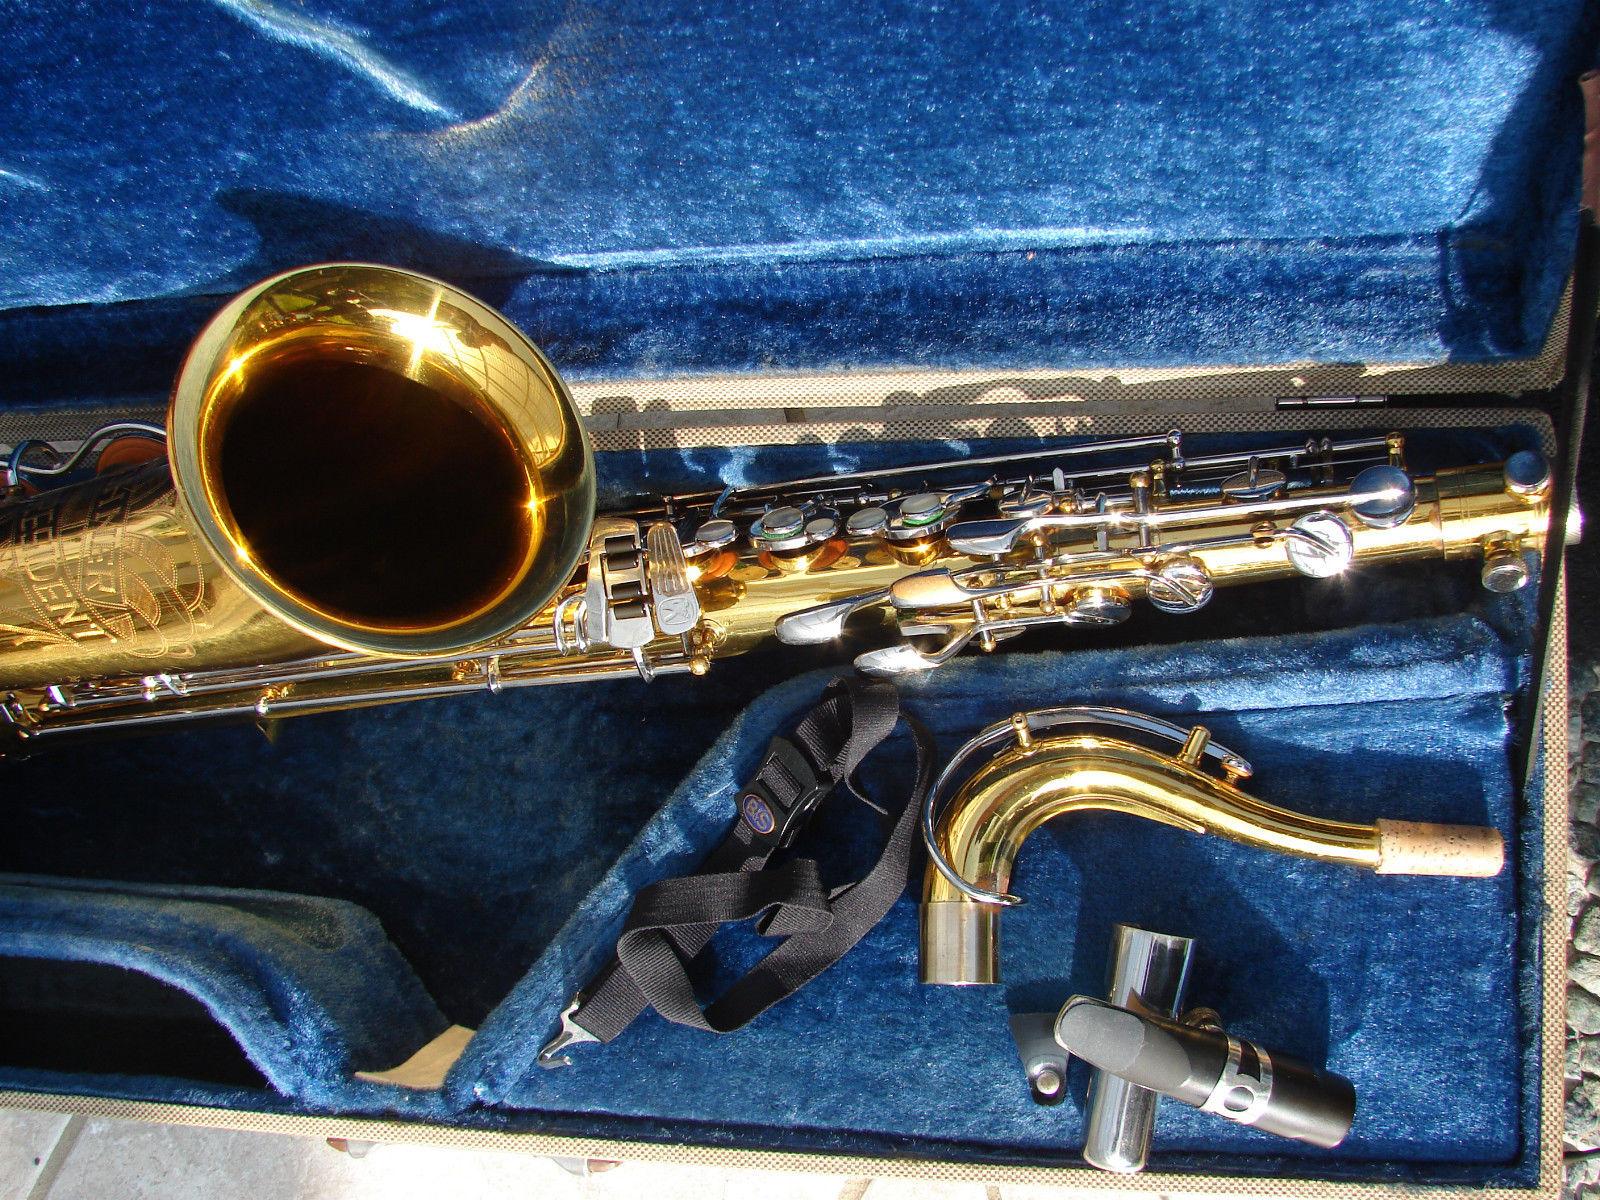 Hohner President, tenor sax, vintage sax, German sax, Max Keilwerth, saxophone, saxophone keys